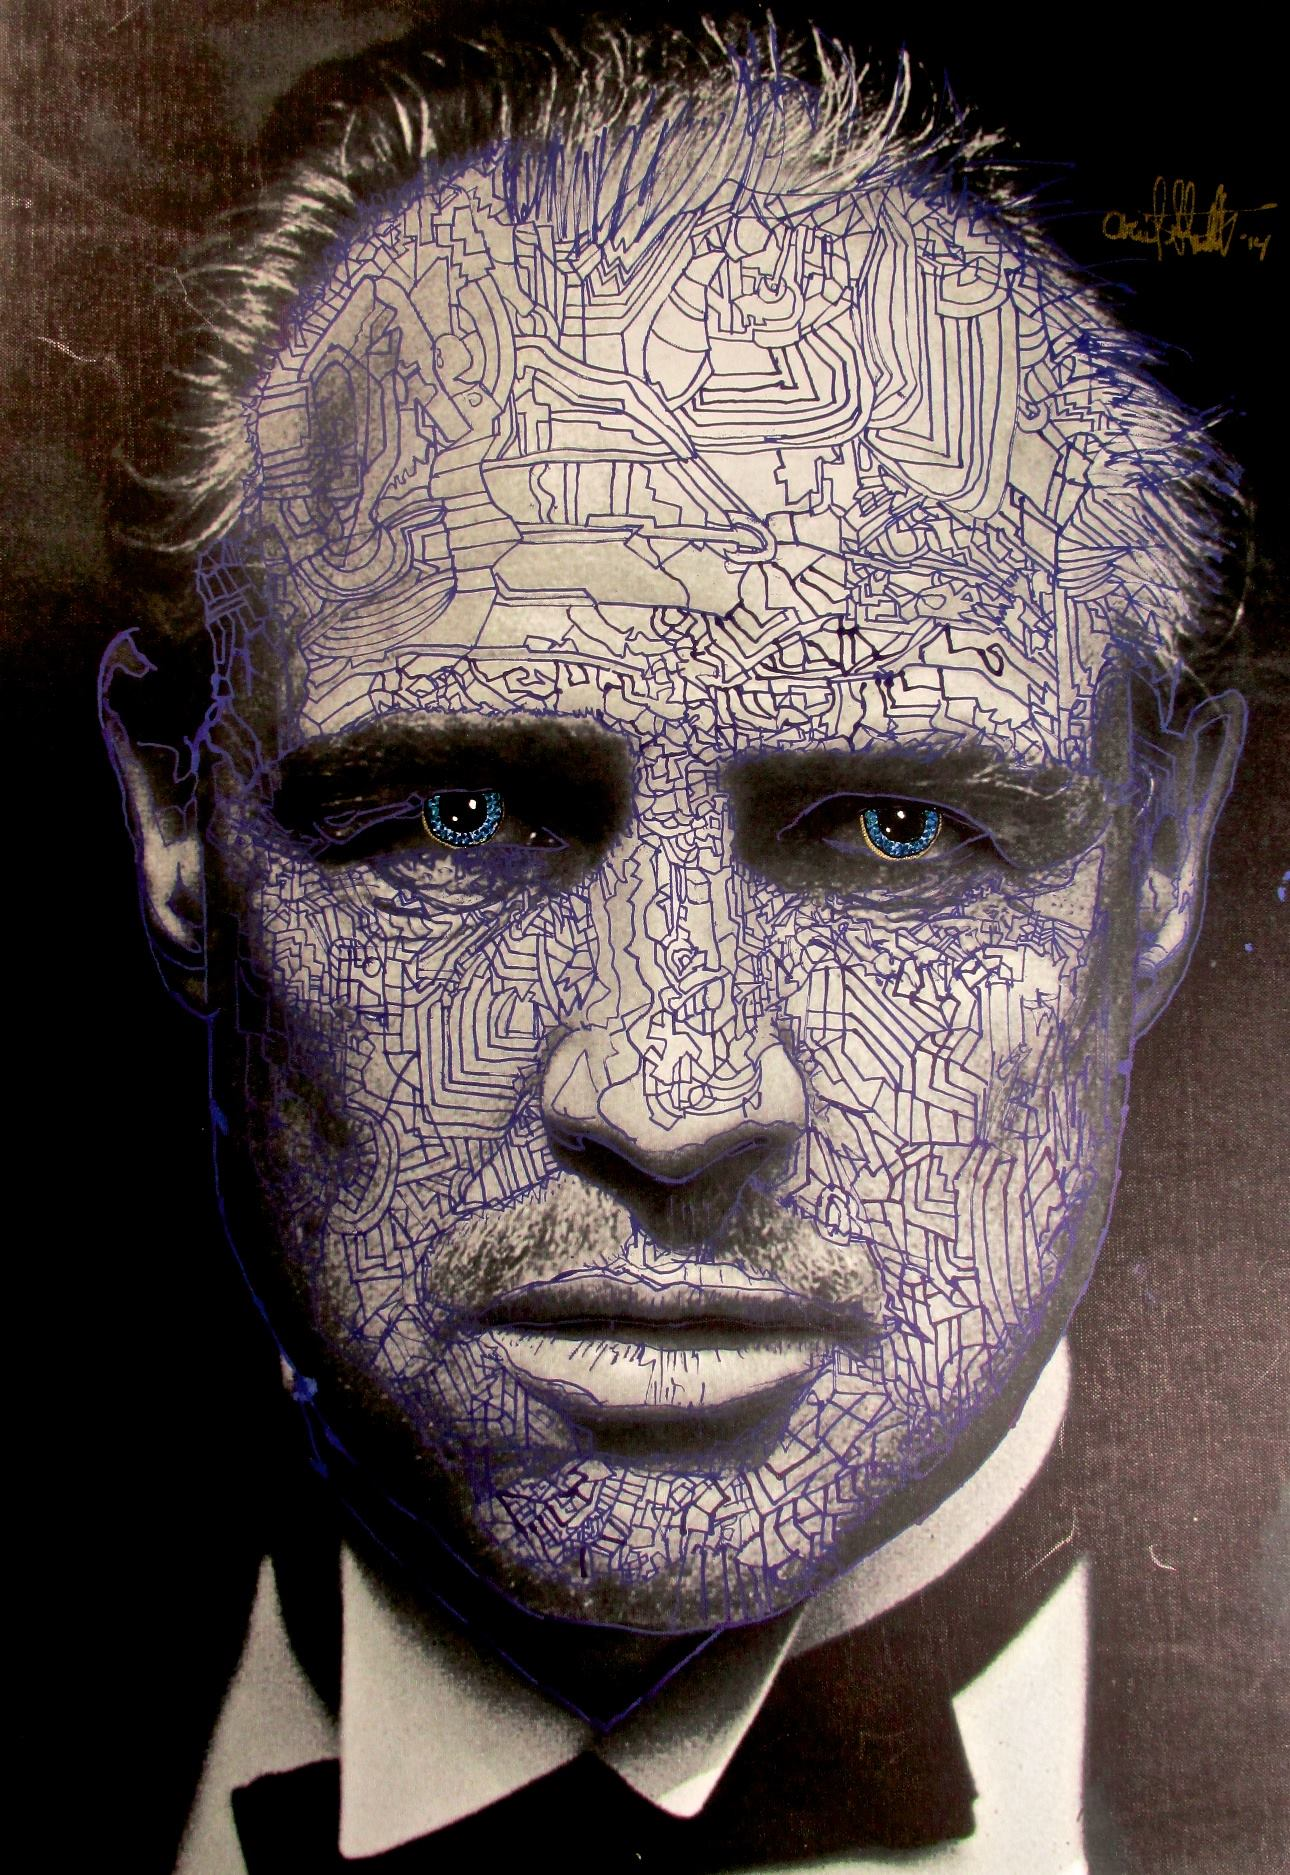 Ariel Shallit painting of Marlon Brando